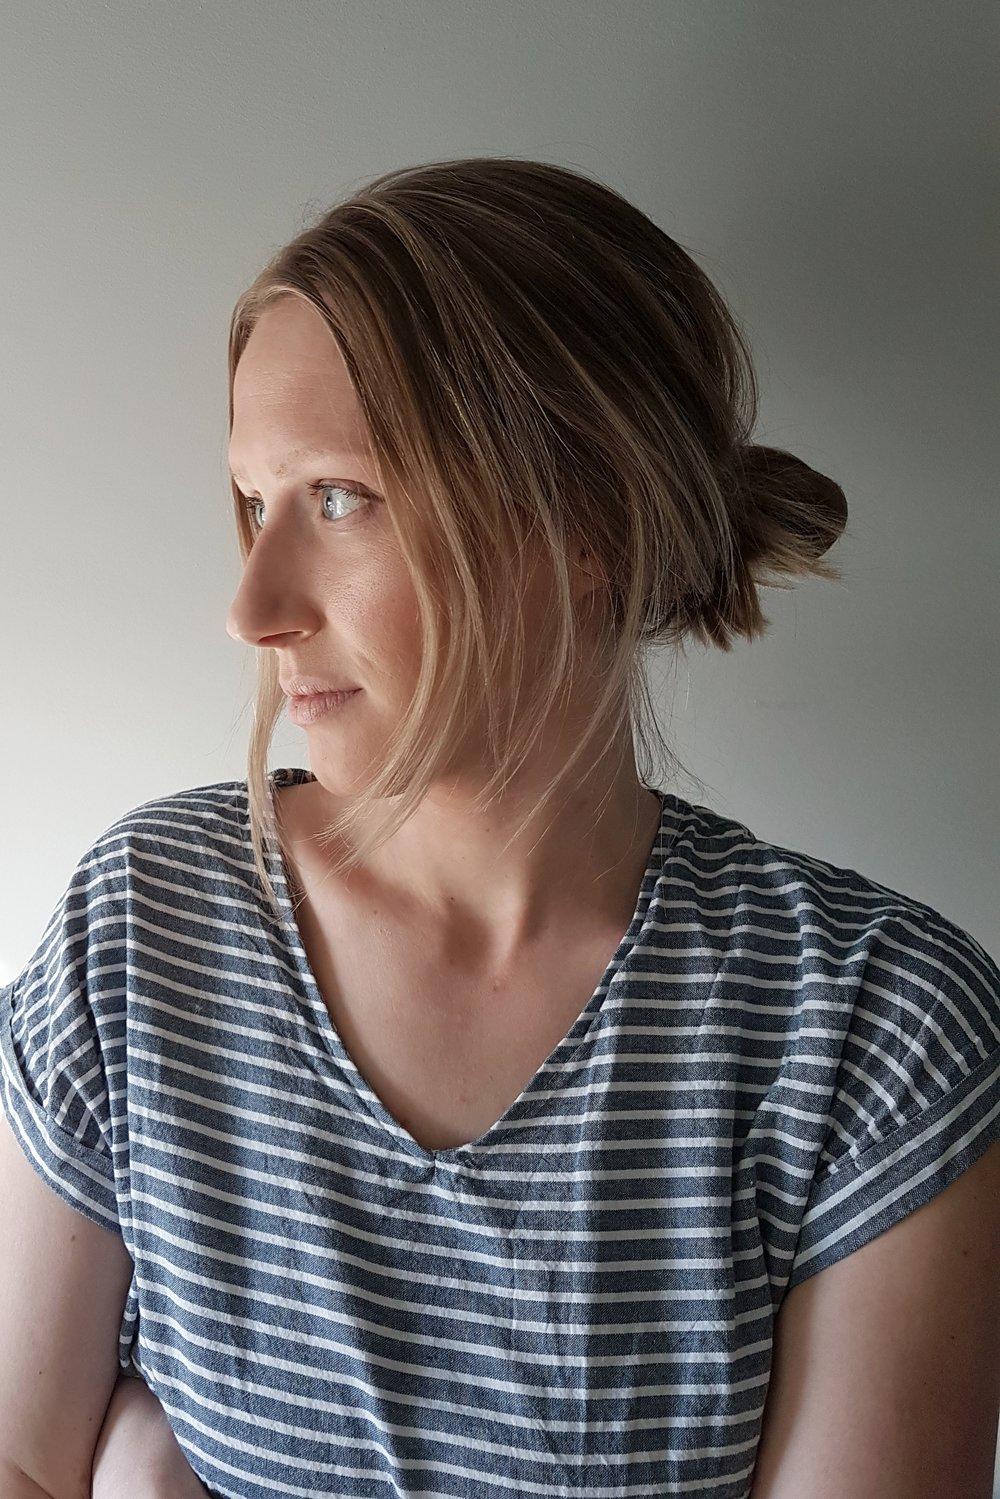 Kayla Gale, self portrait